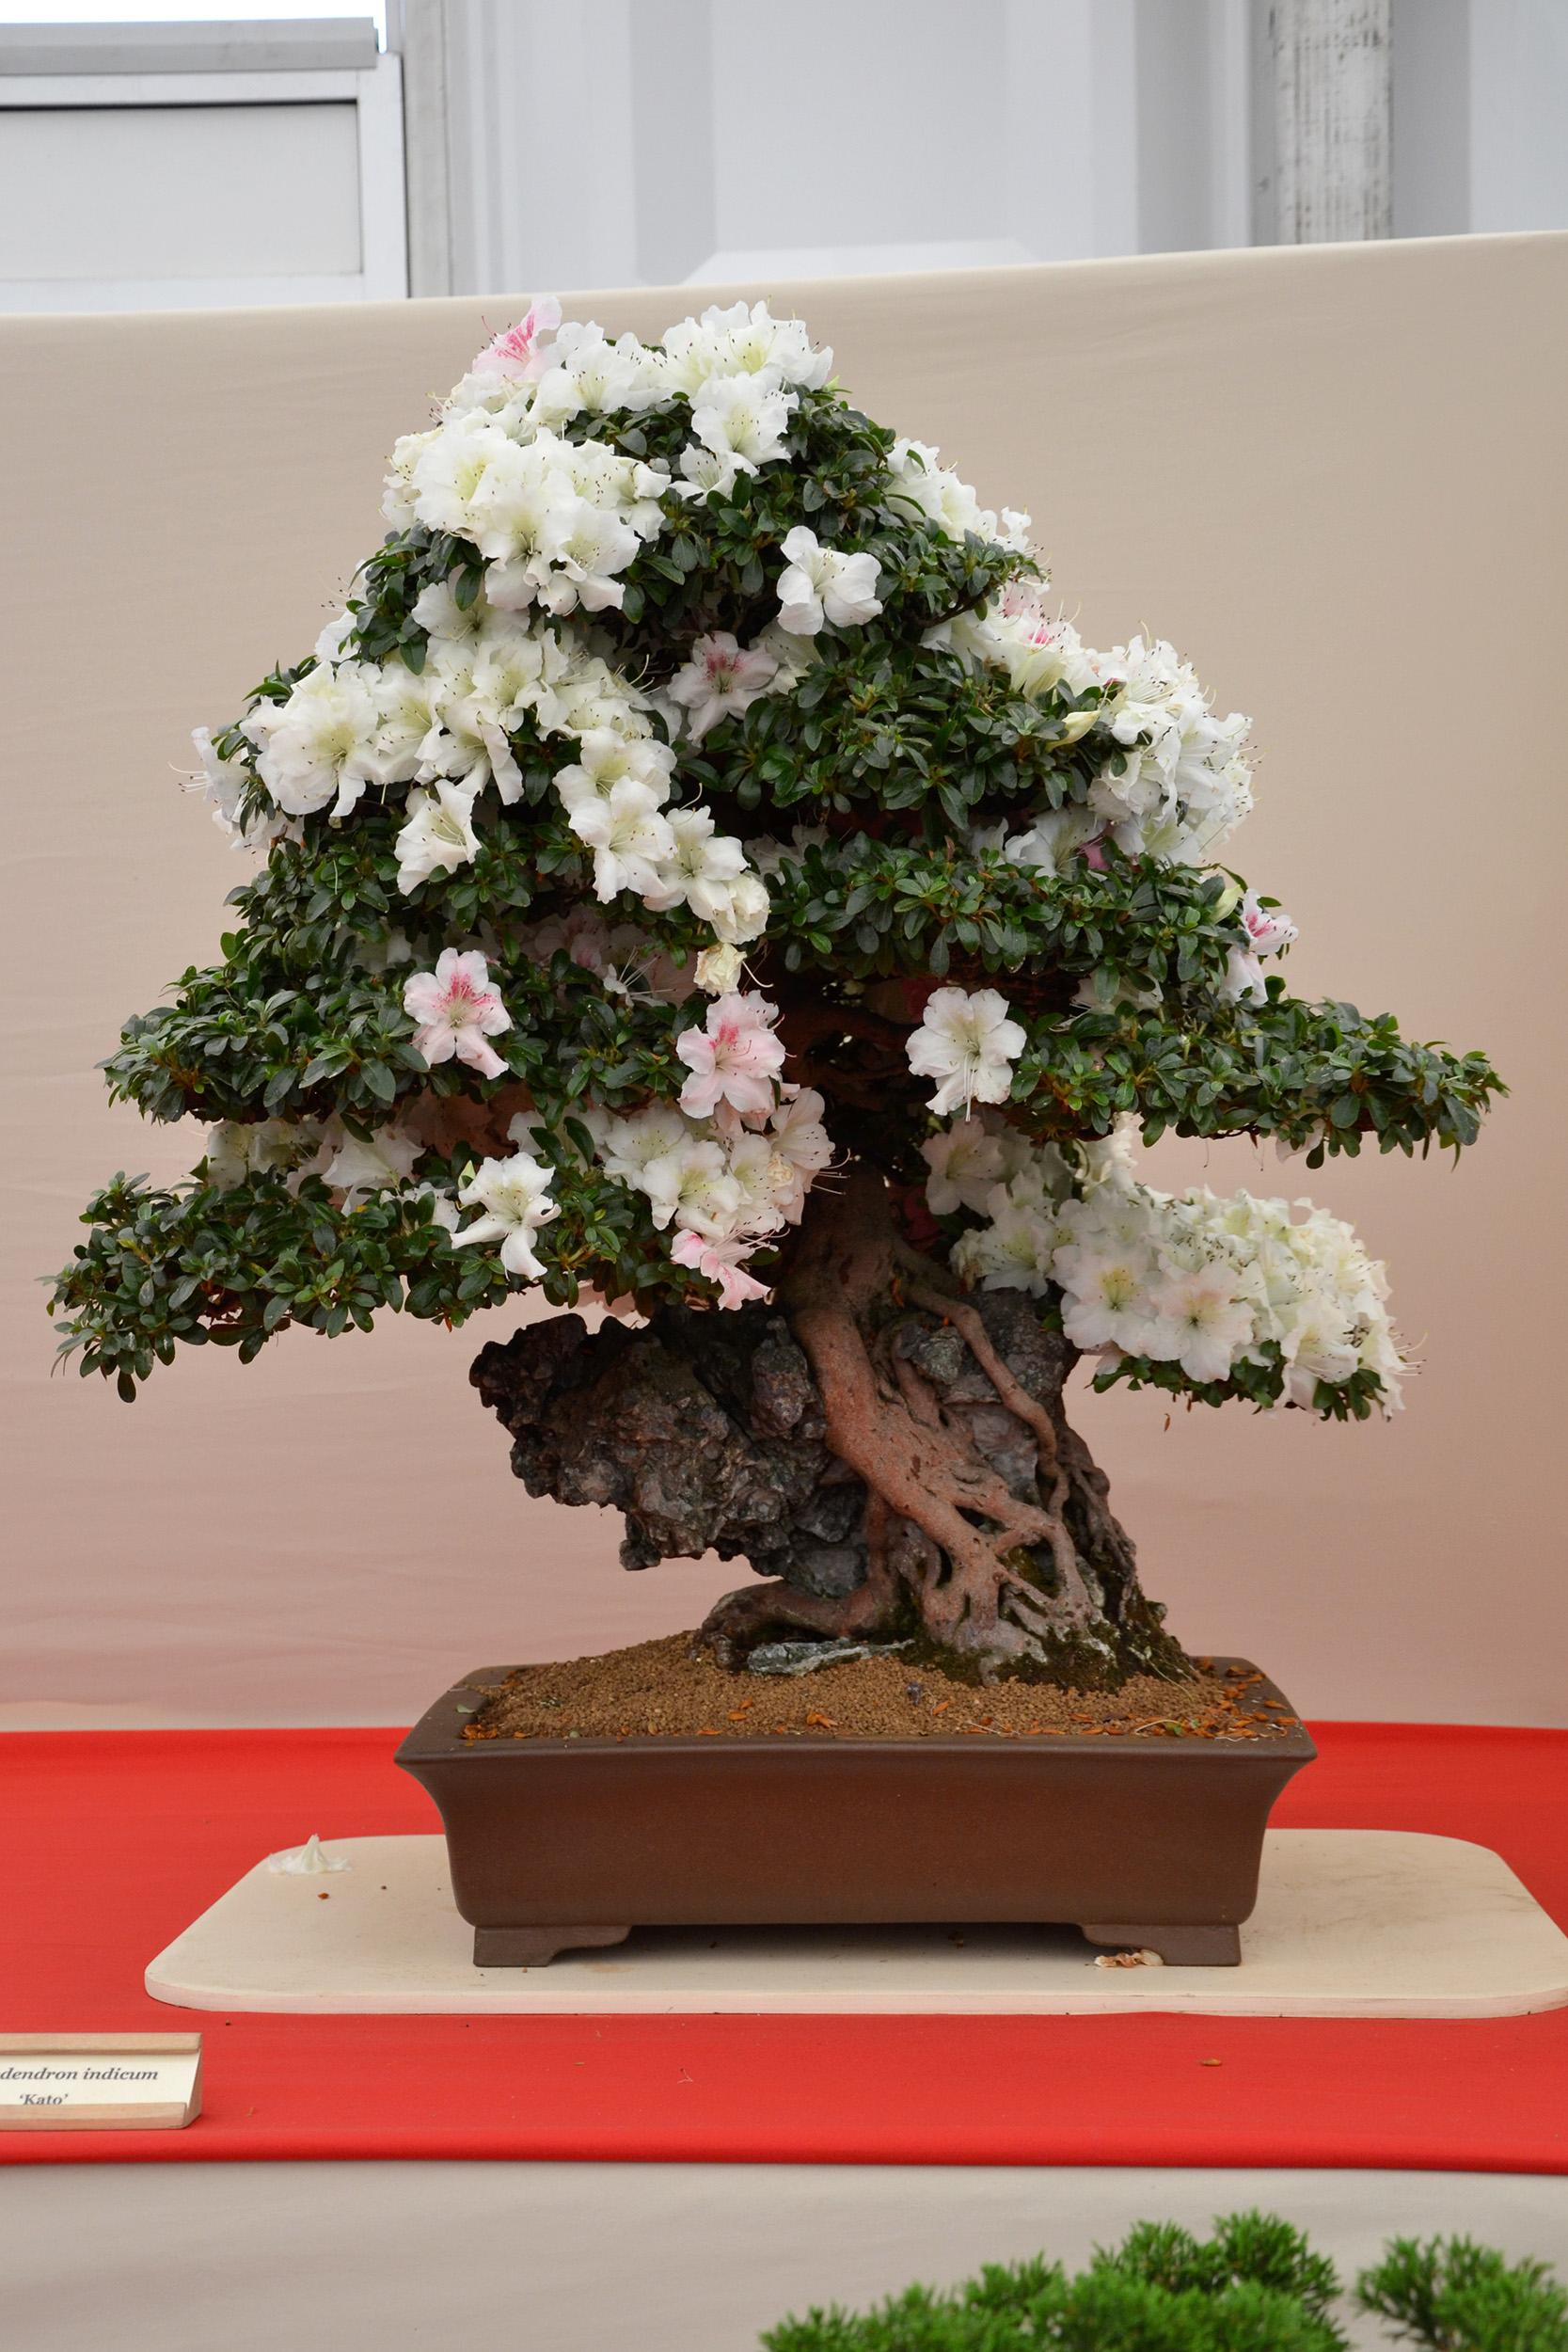 Rhododendron indicum 'kato' photo